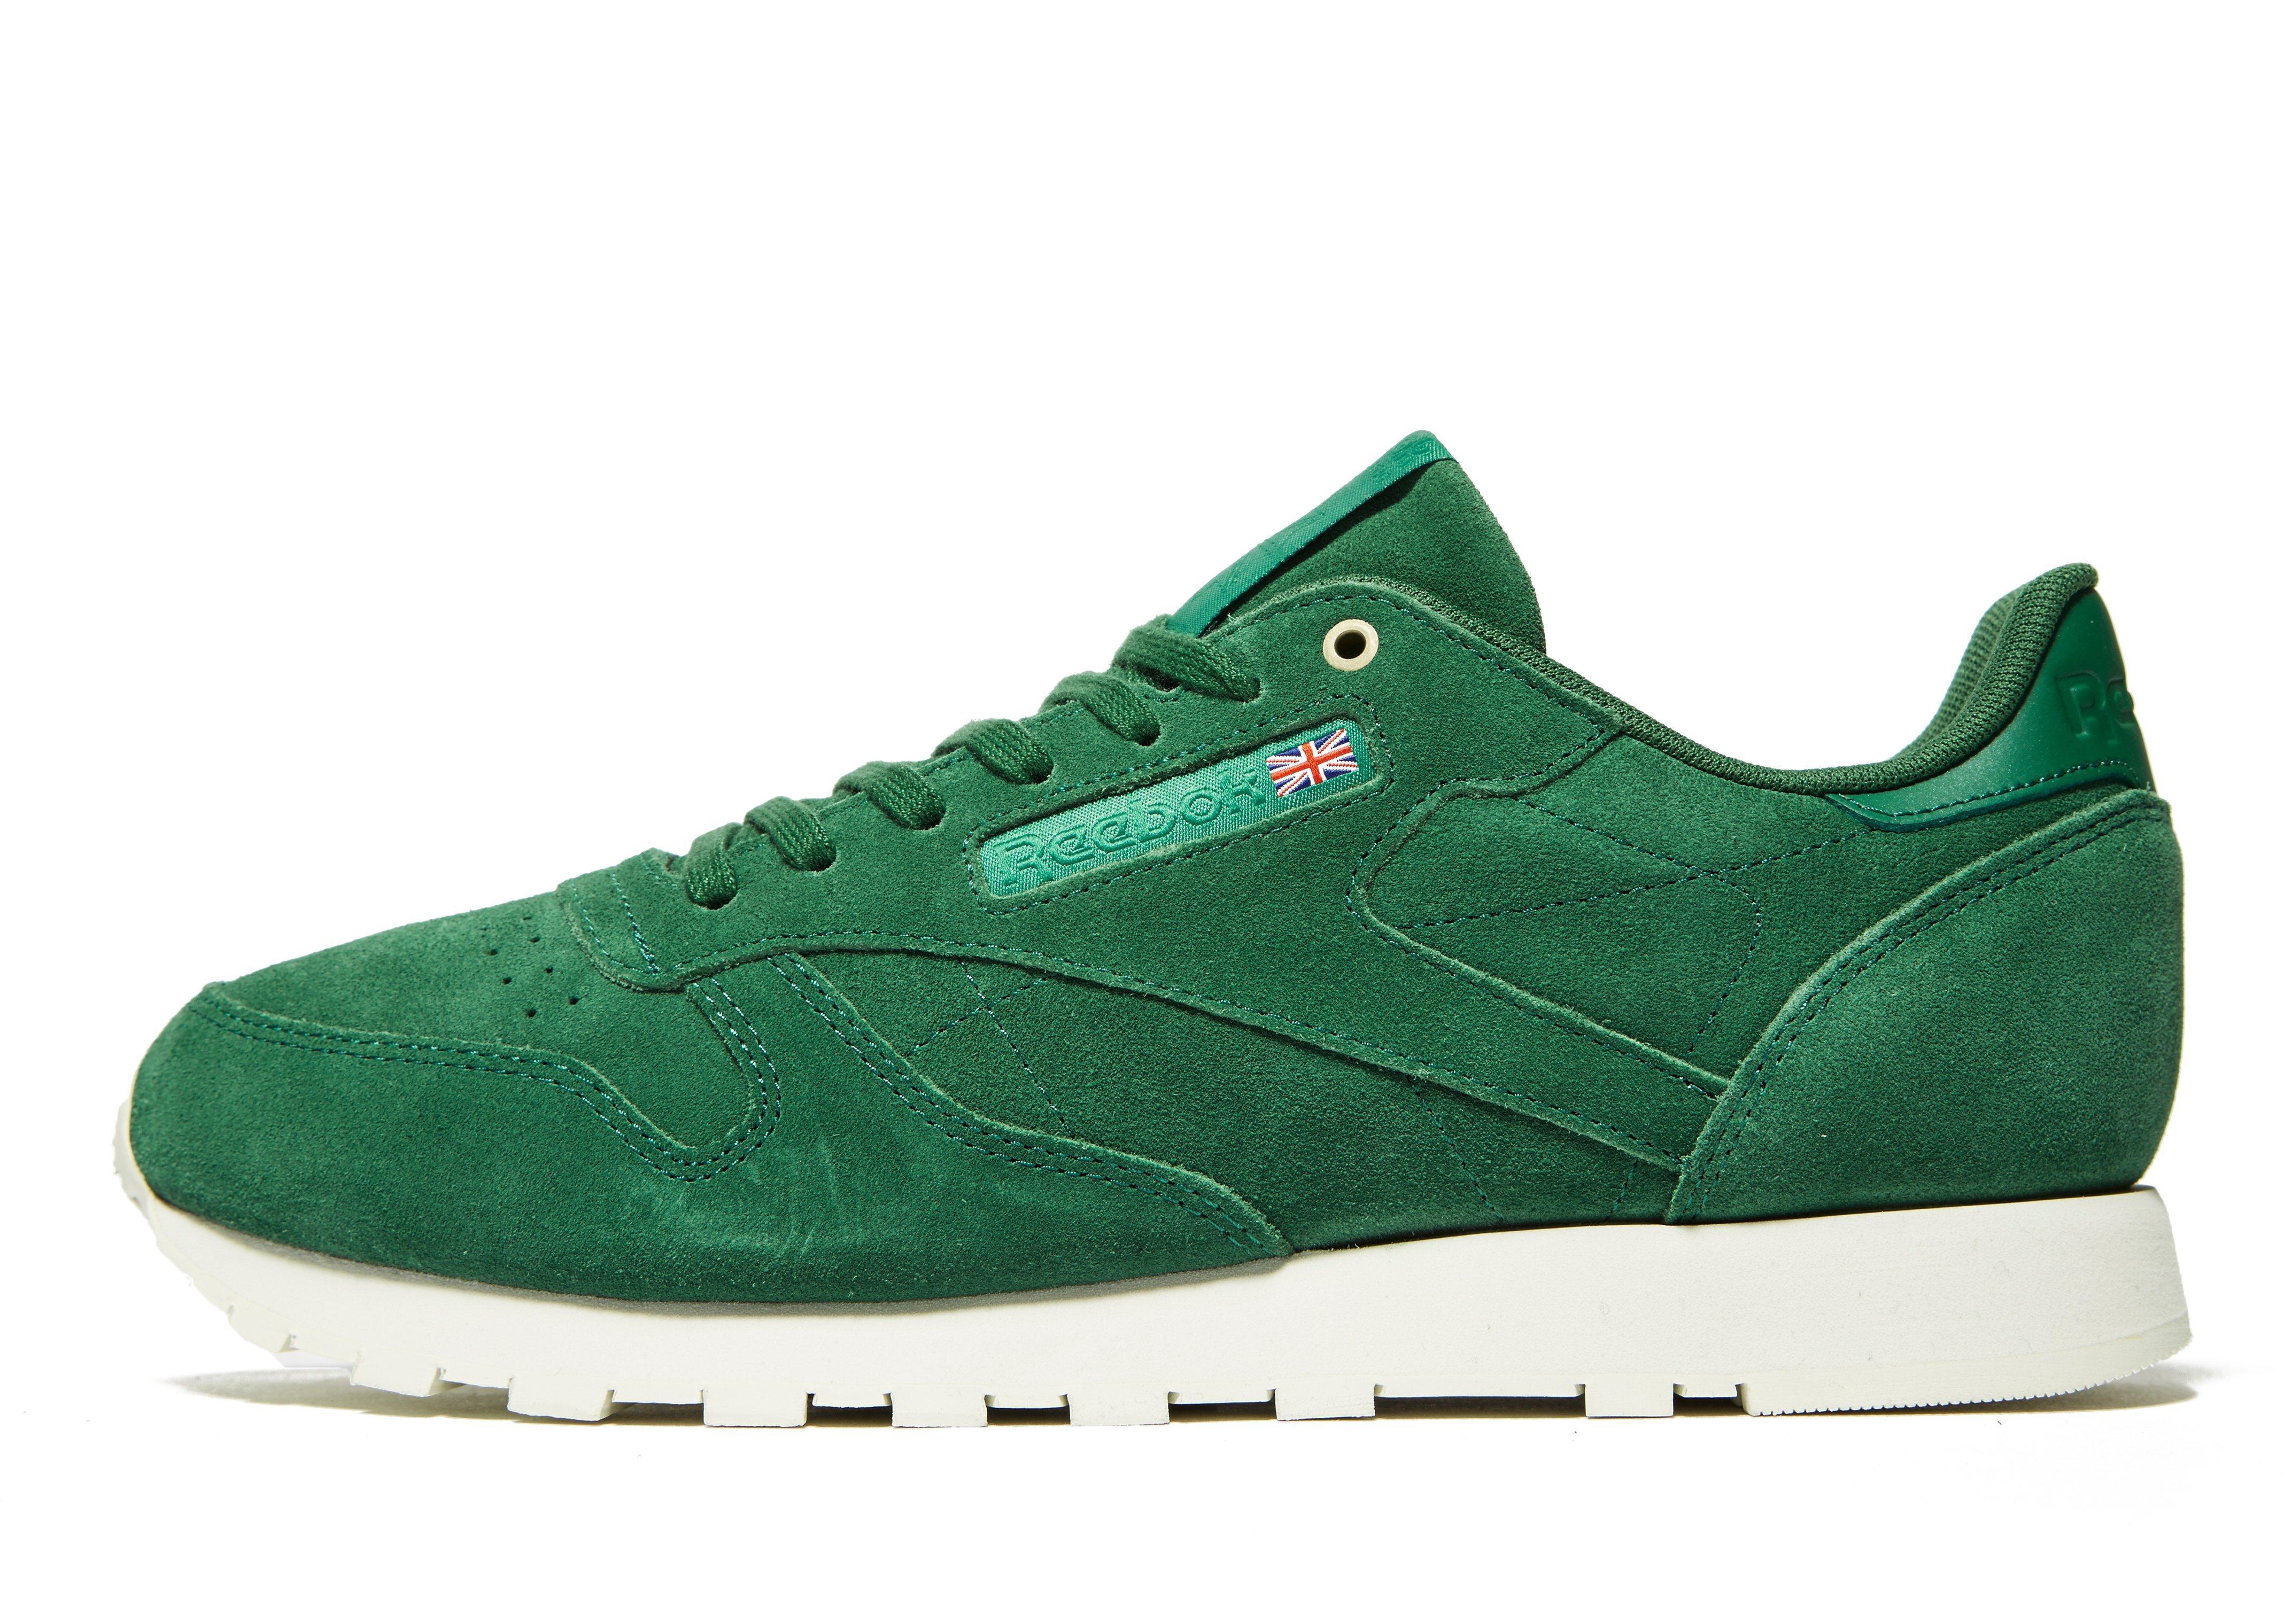 da8aa851fc82 Lyst - Reebok Classic Leather Mcc in Green for Men